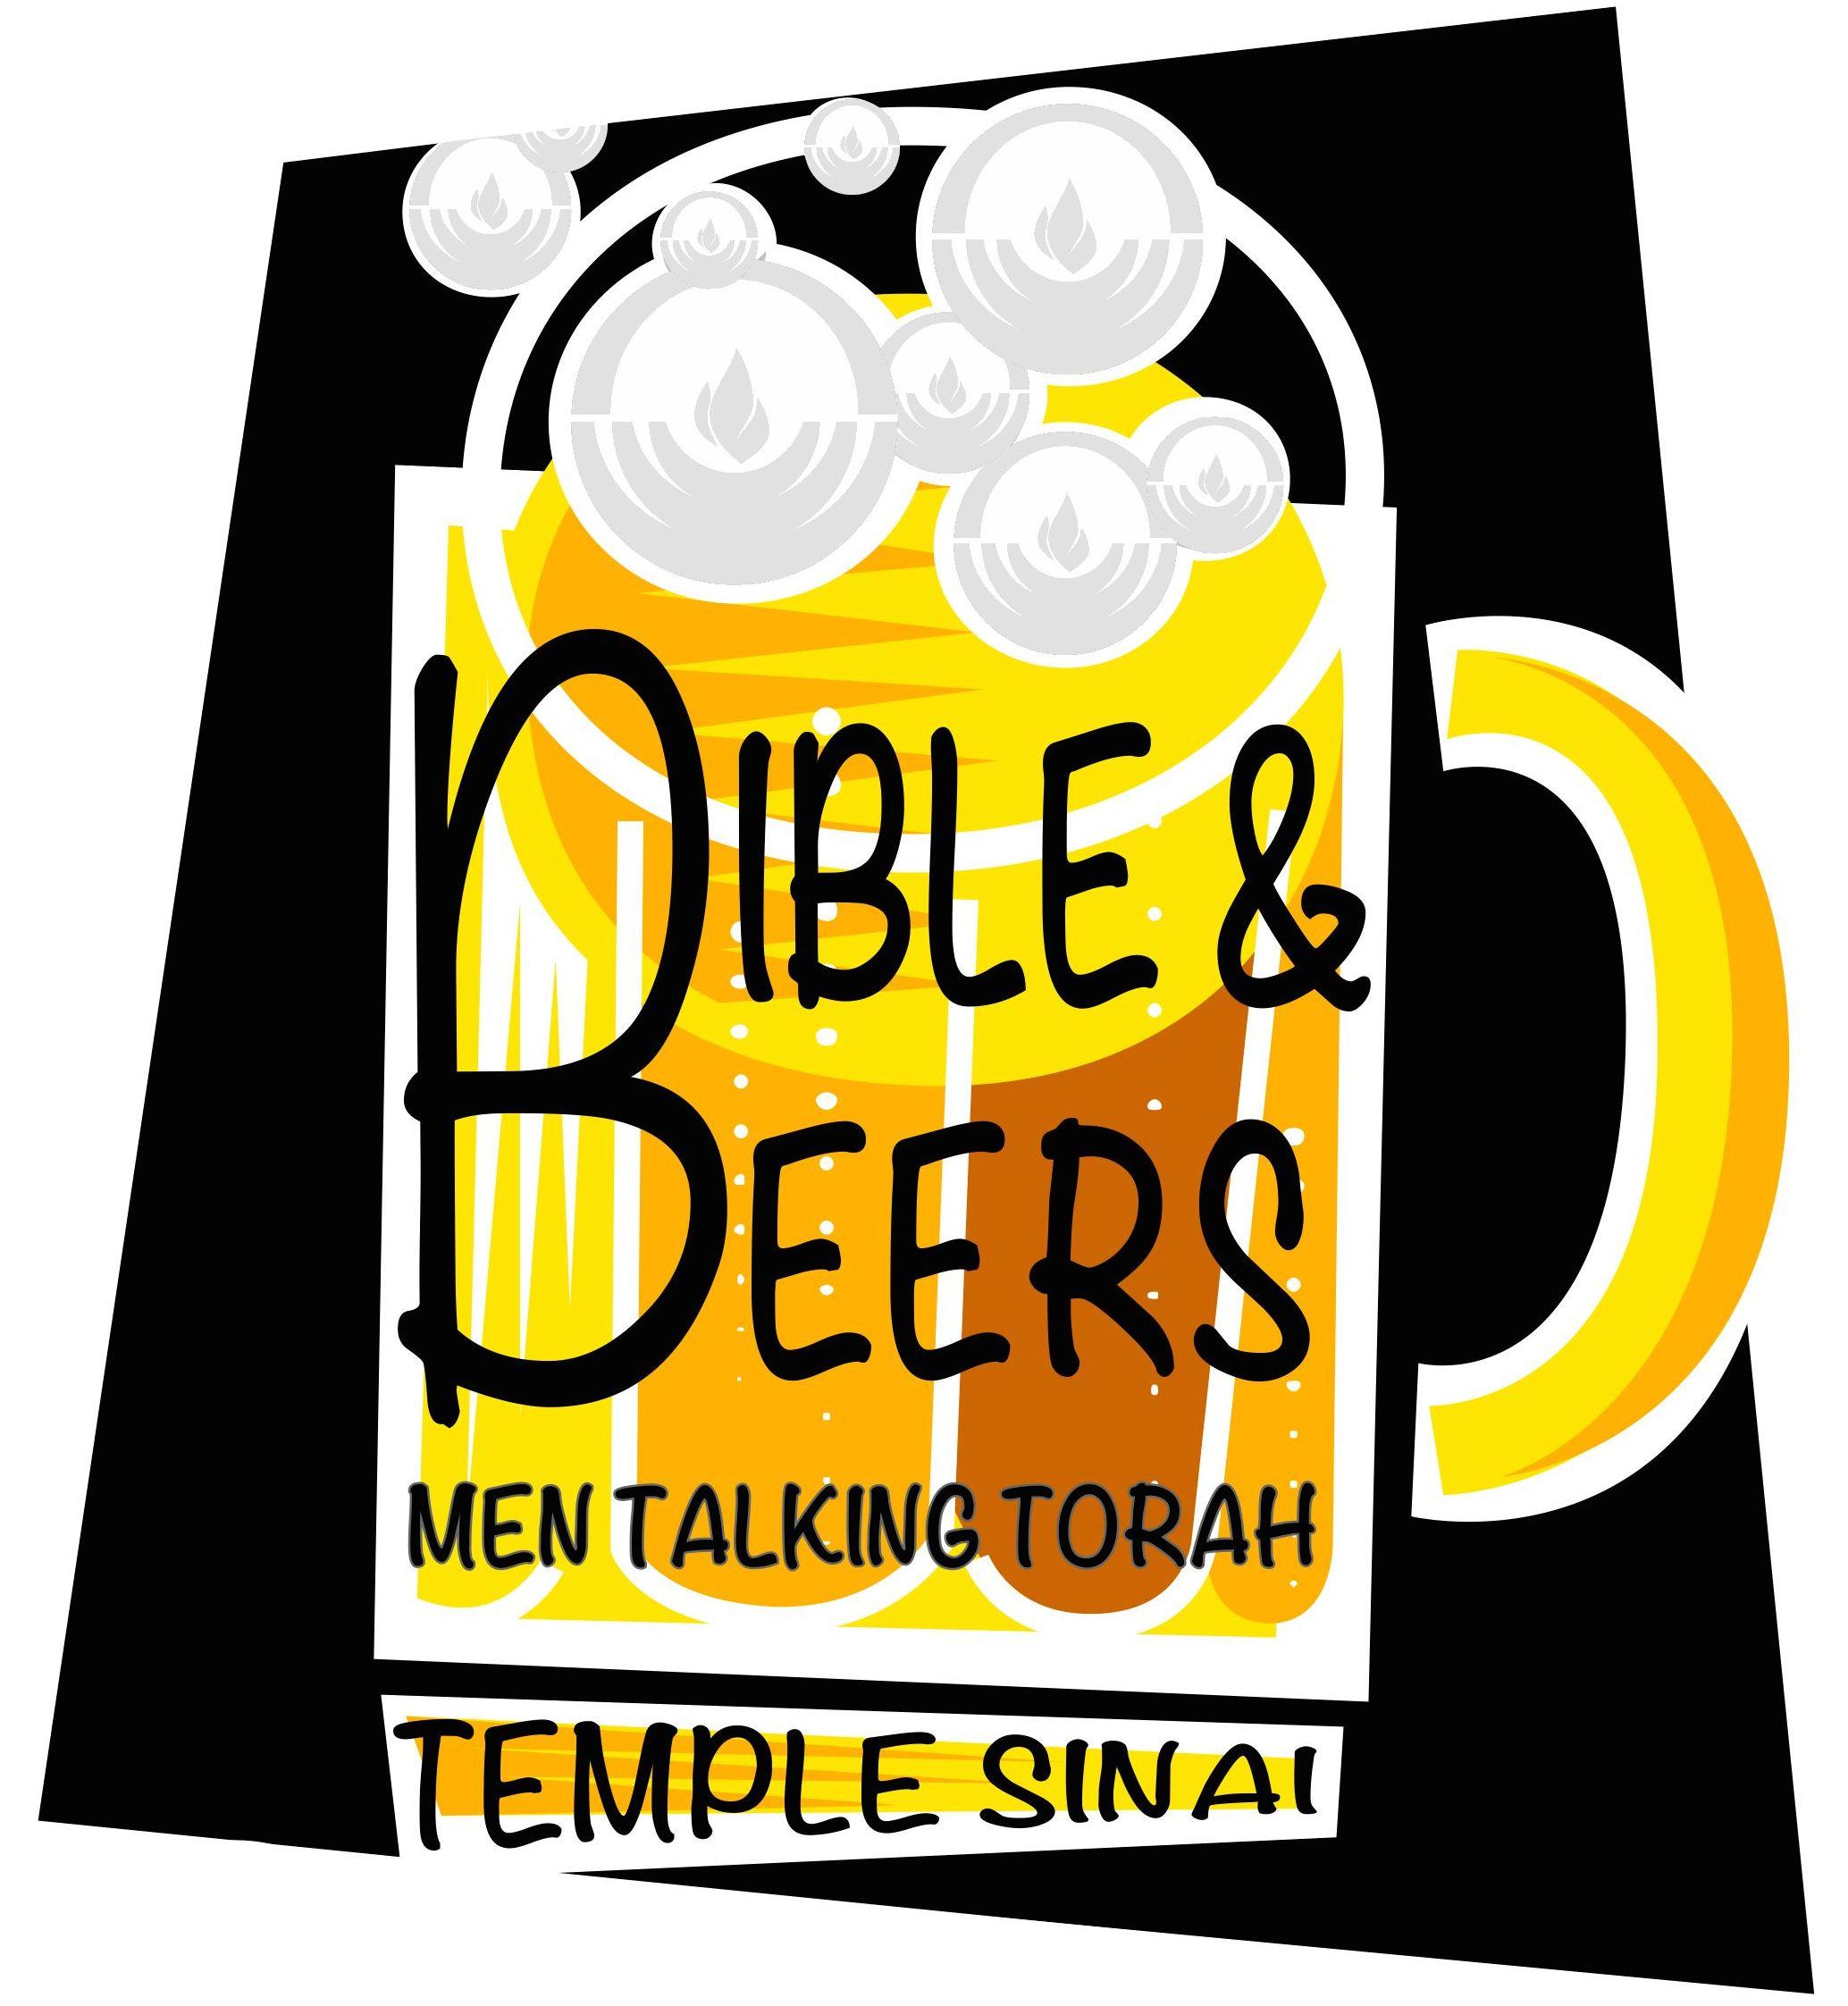 Brotherhood clipart social committee Brotherhood & Bible Beers